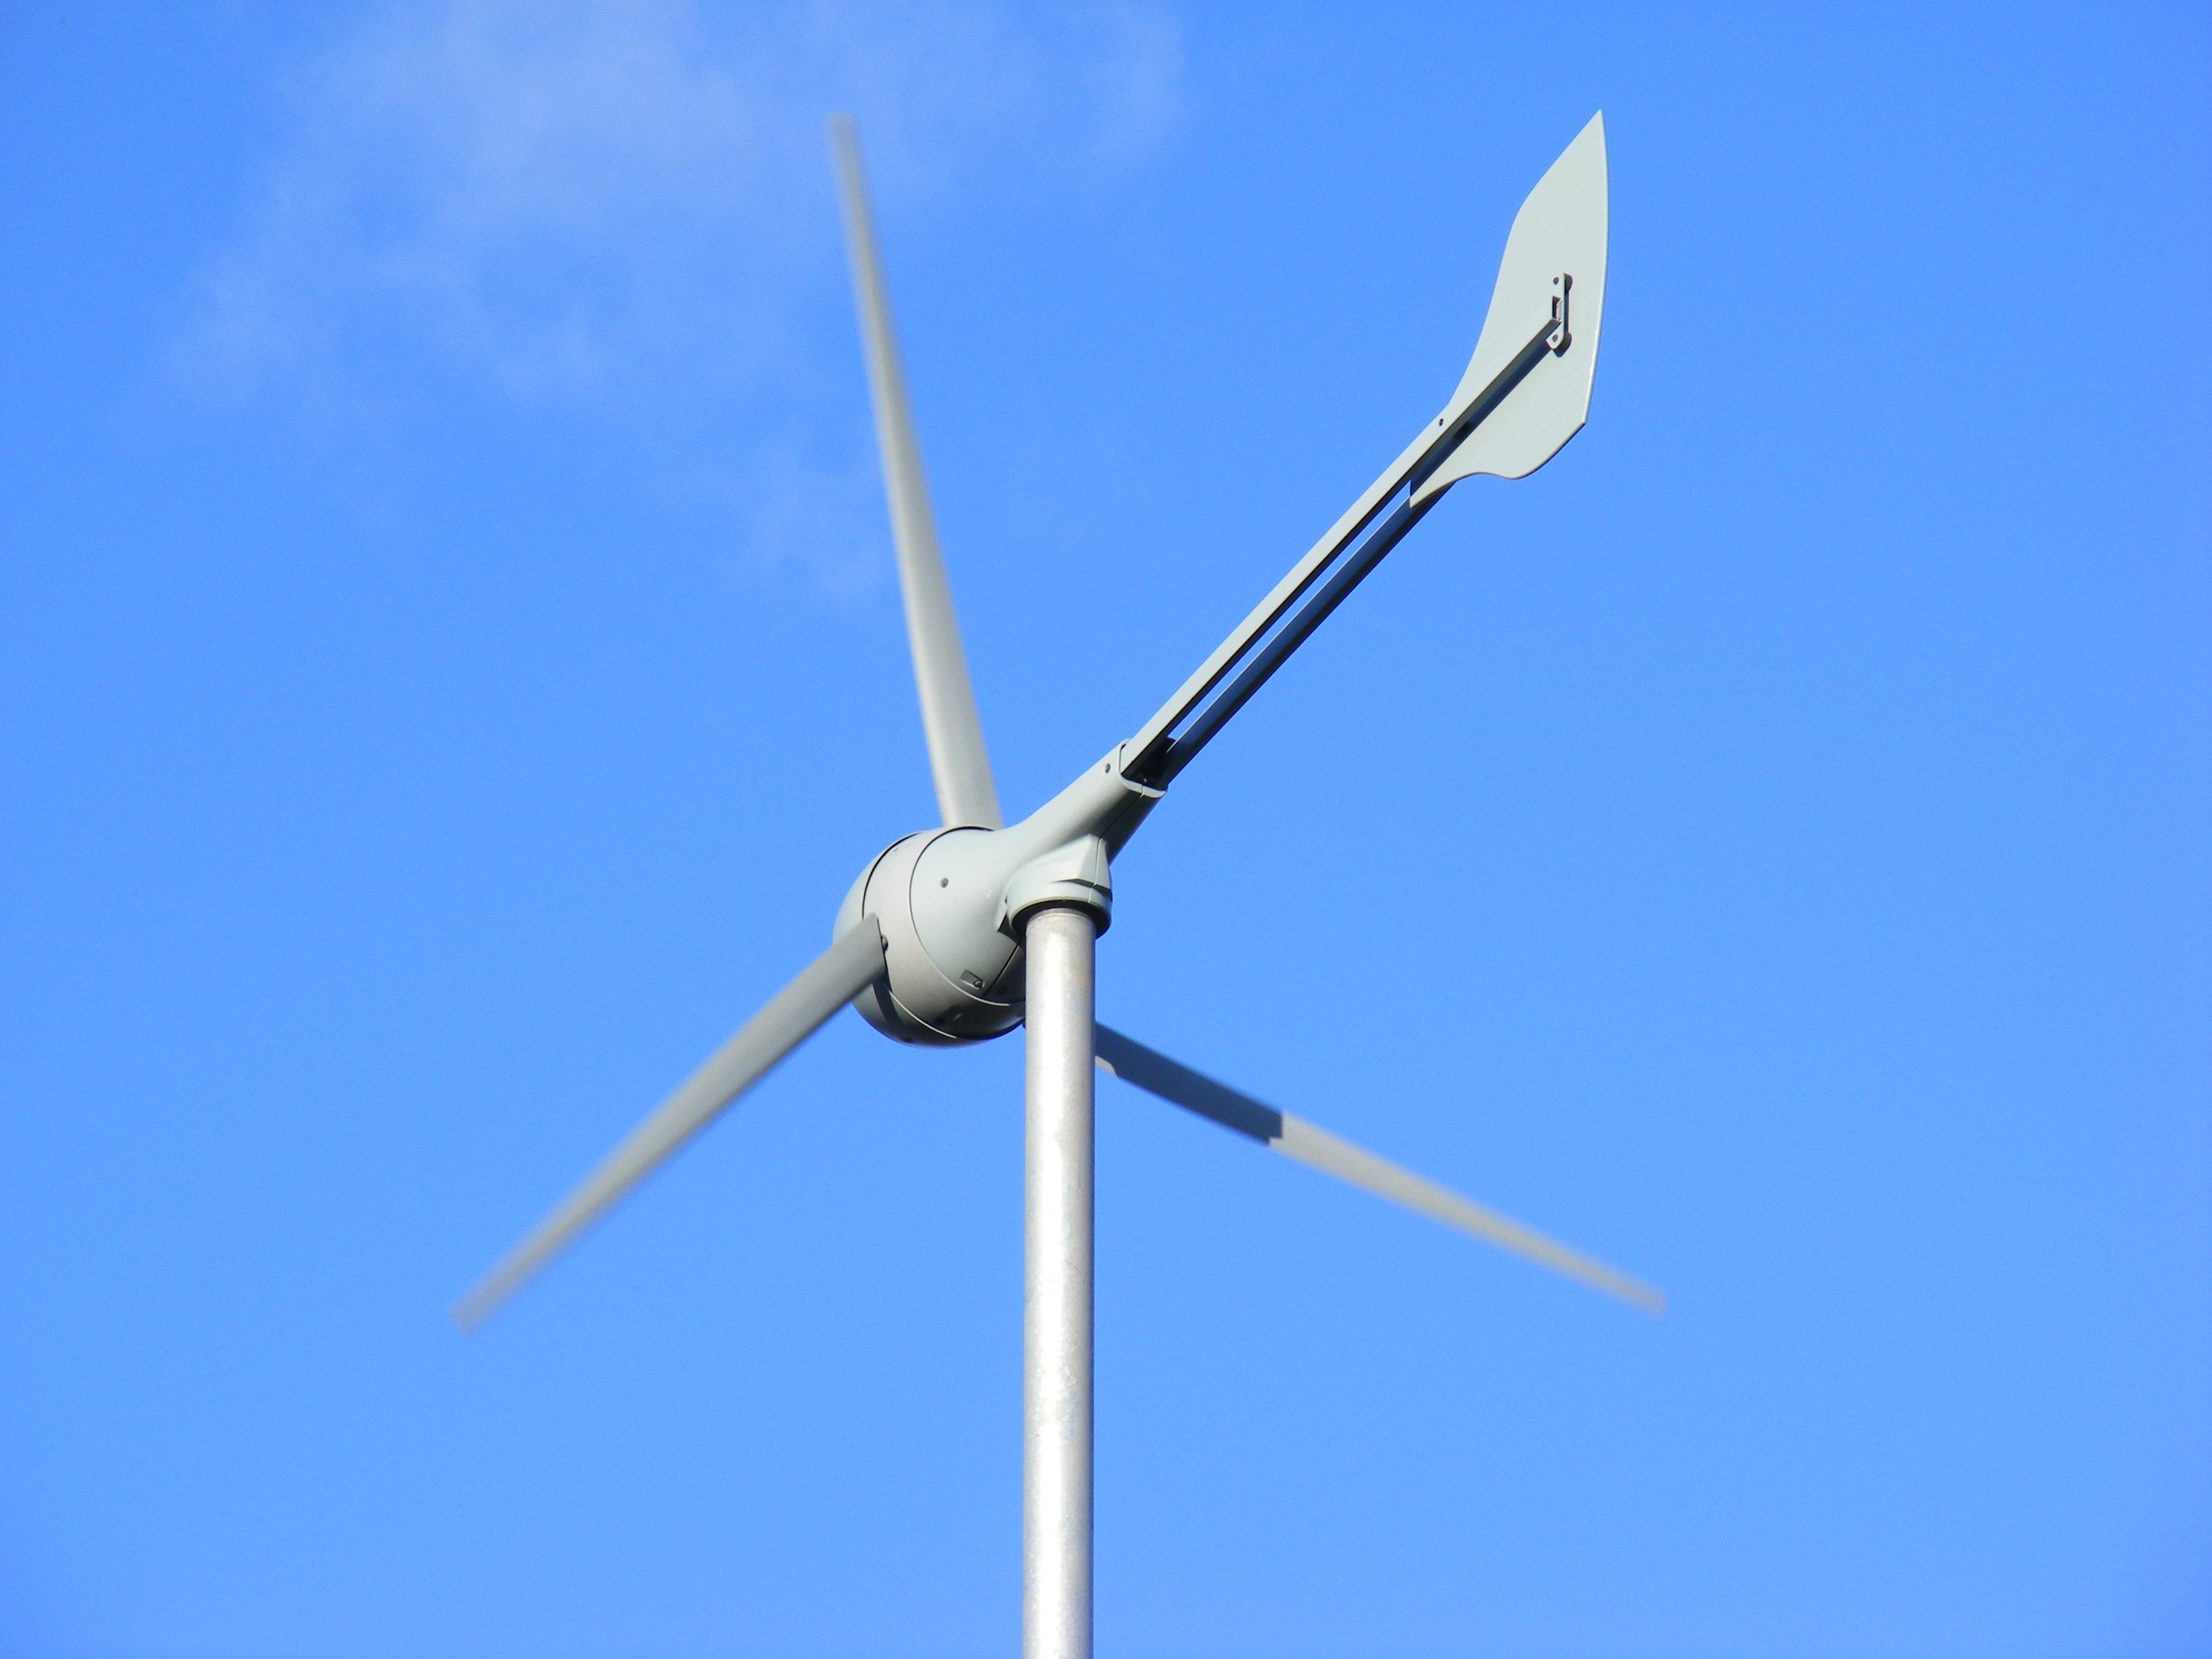 File:Evance R9000 5kW small domestic wind turbine.JPG - Wikimedia ...